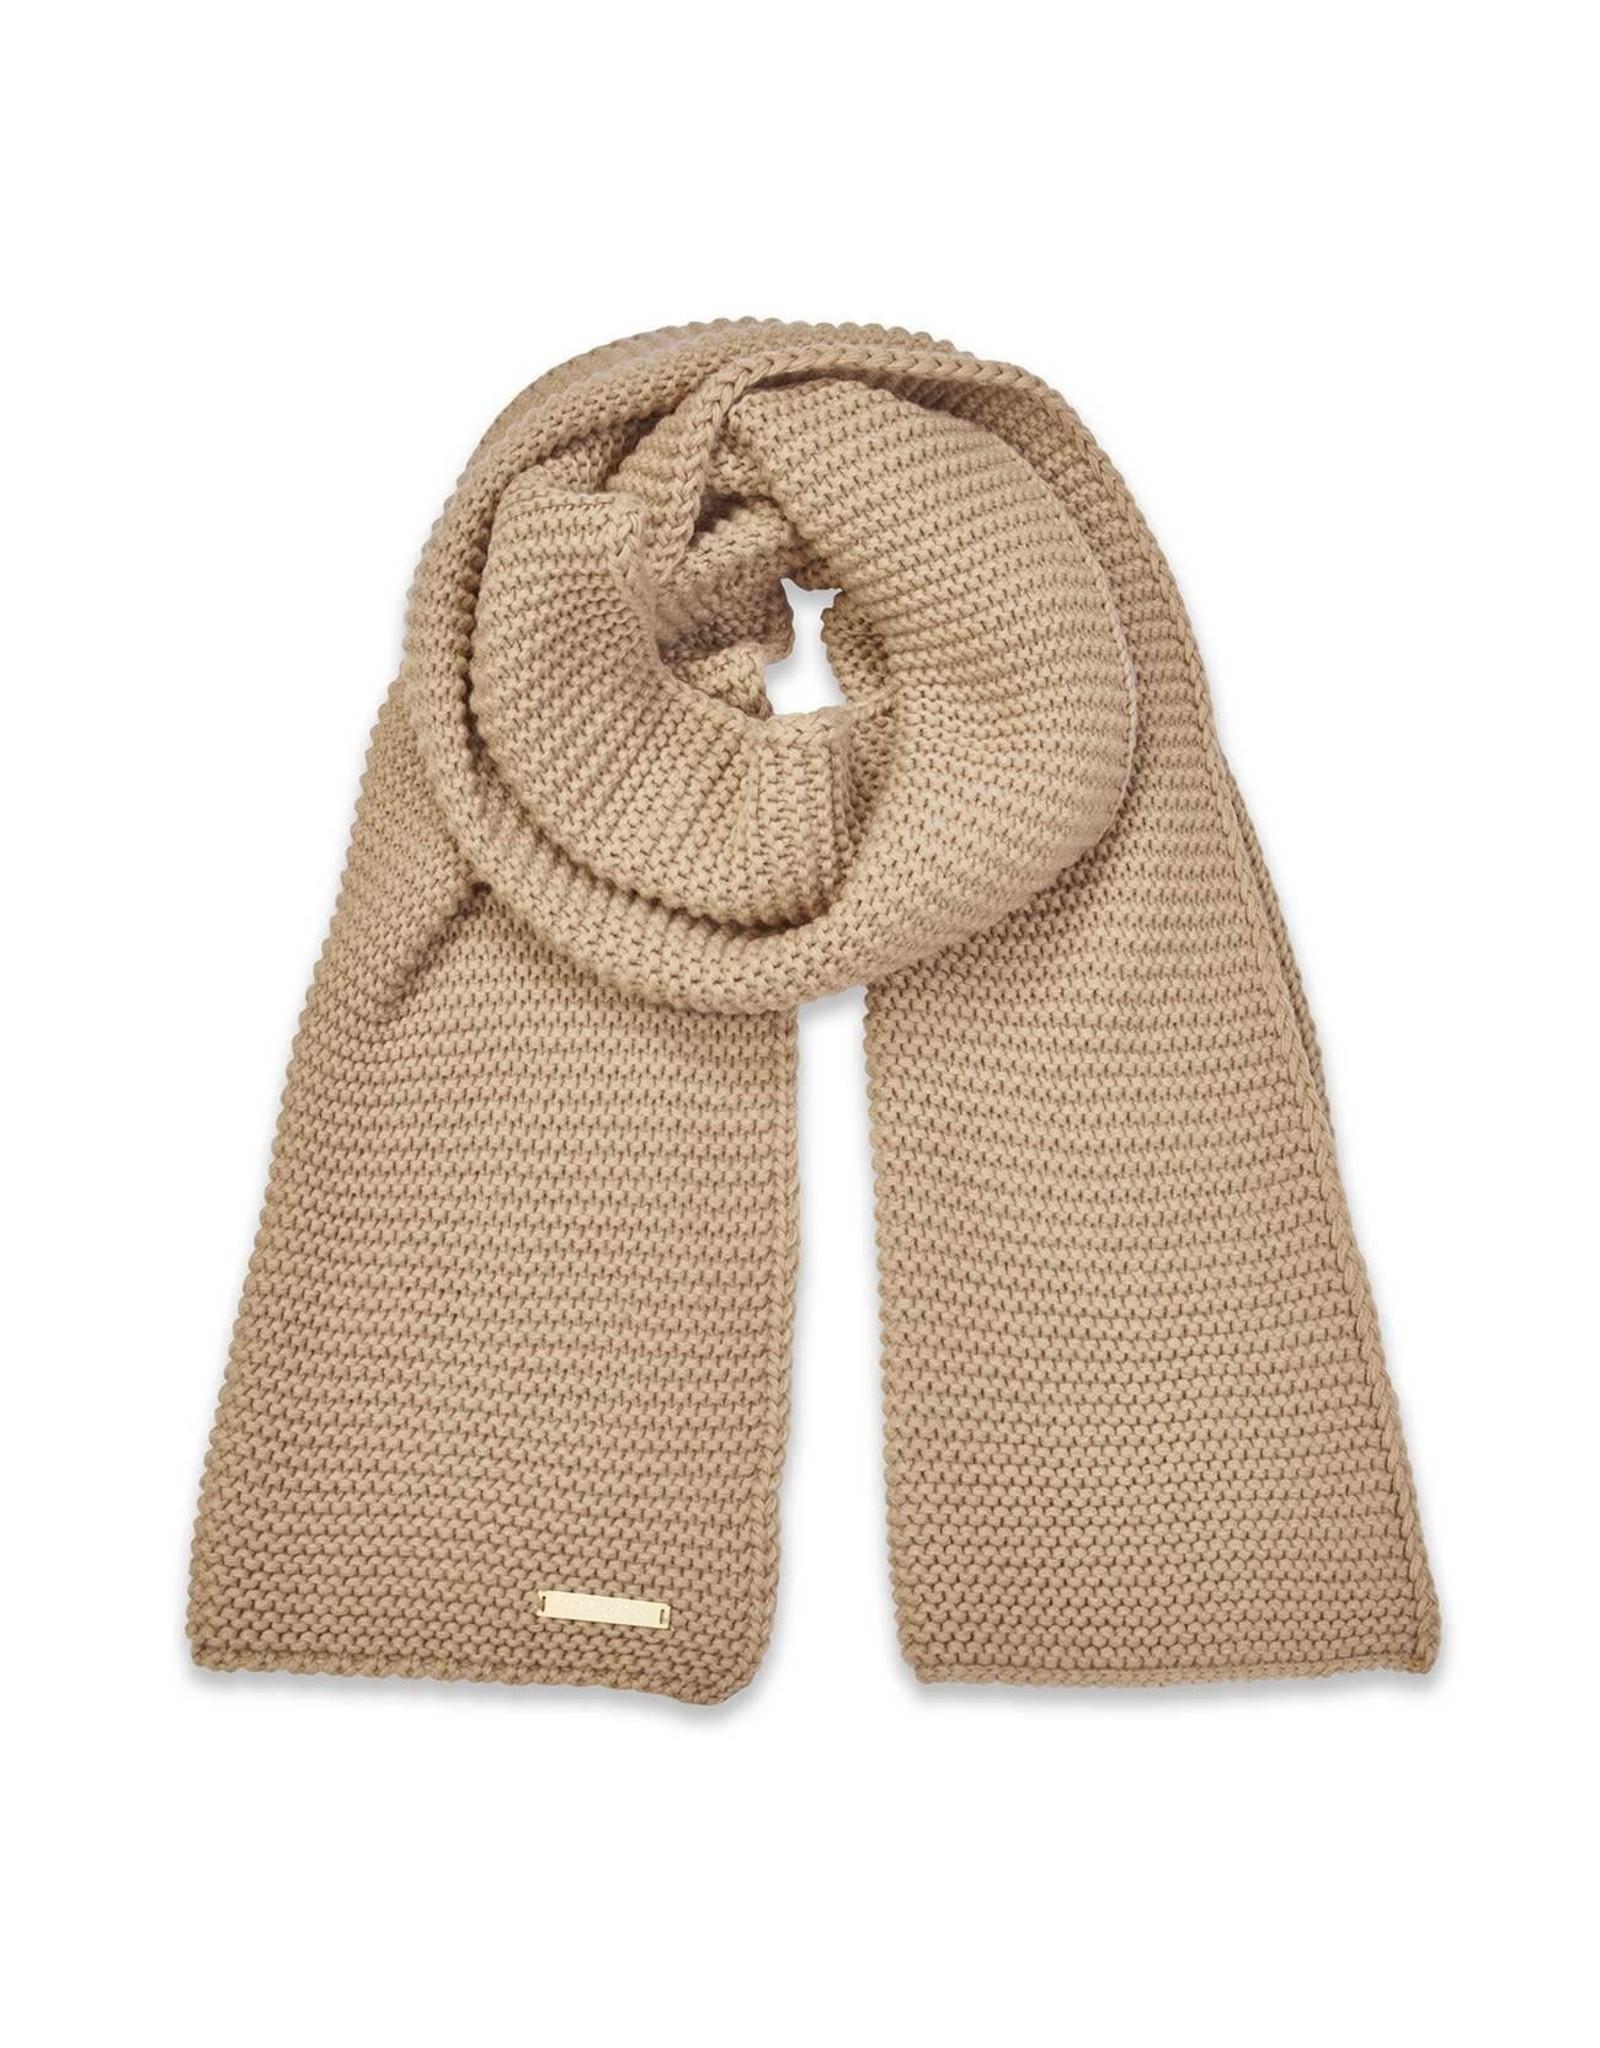 Katie Loxton Sjaal - Chunky Knit - Caramel